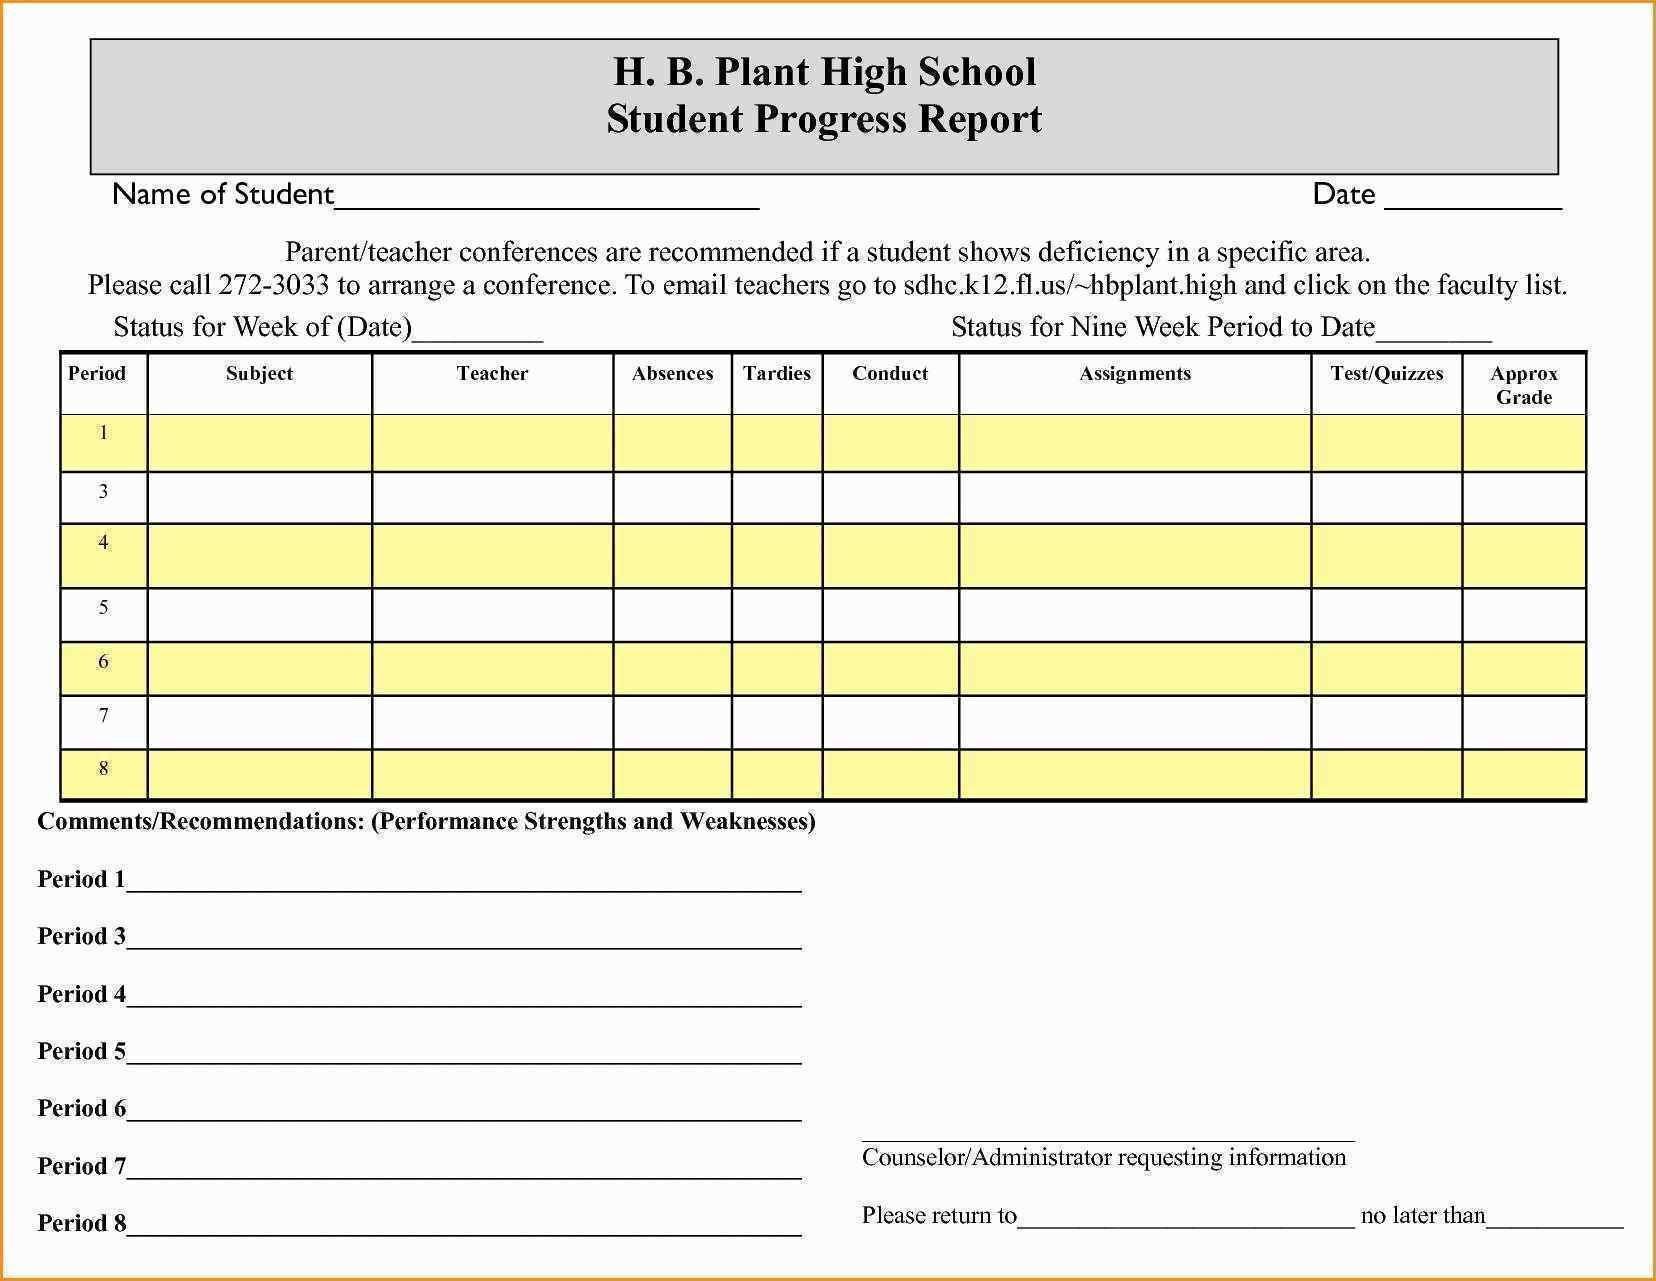 School Progress Report Template  Glendale Community With Regard To High School Progress Report Template